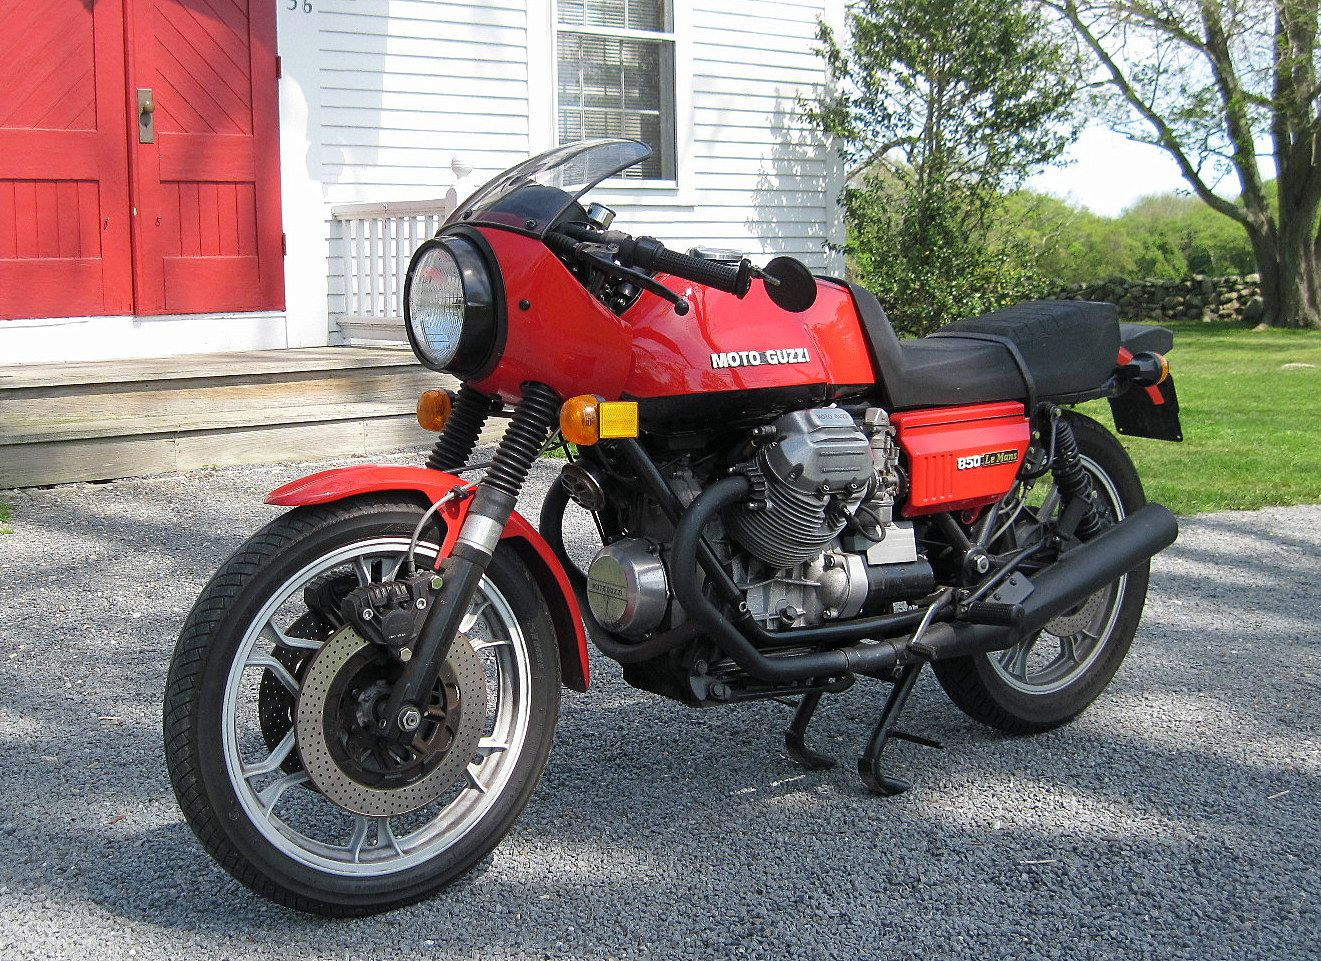 http://onlymotorbikes.com/public/83/moto-guzzi-le-mans-1000-1990-moto.jpeg